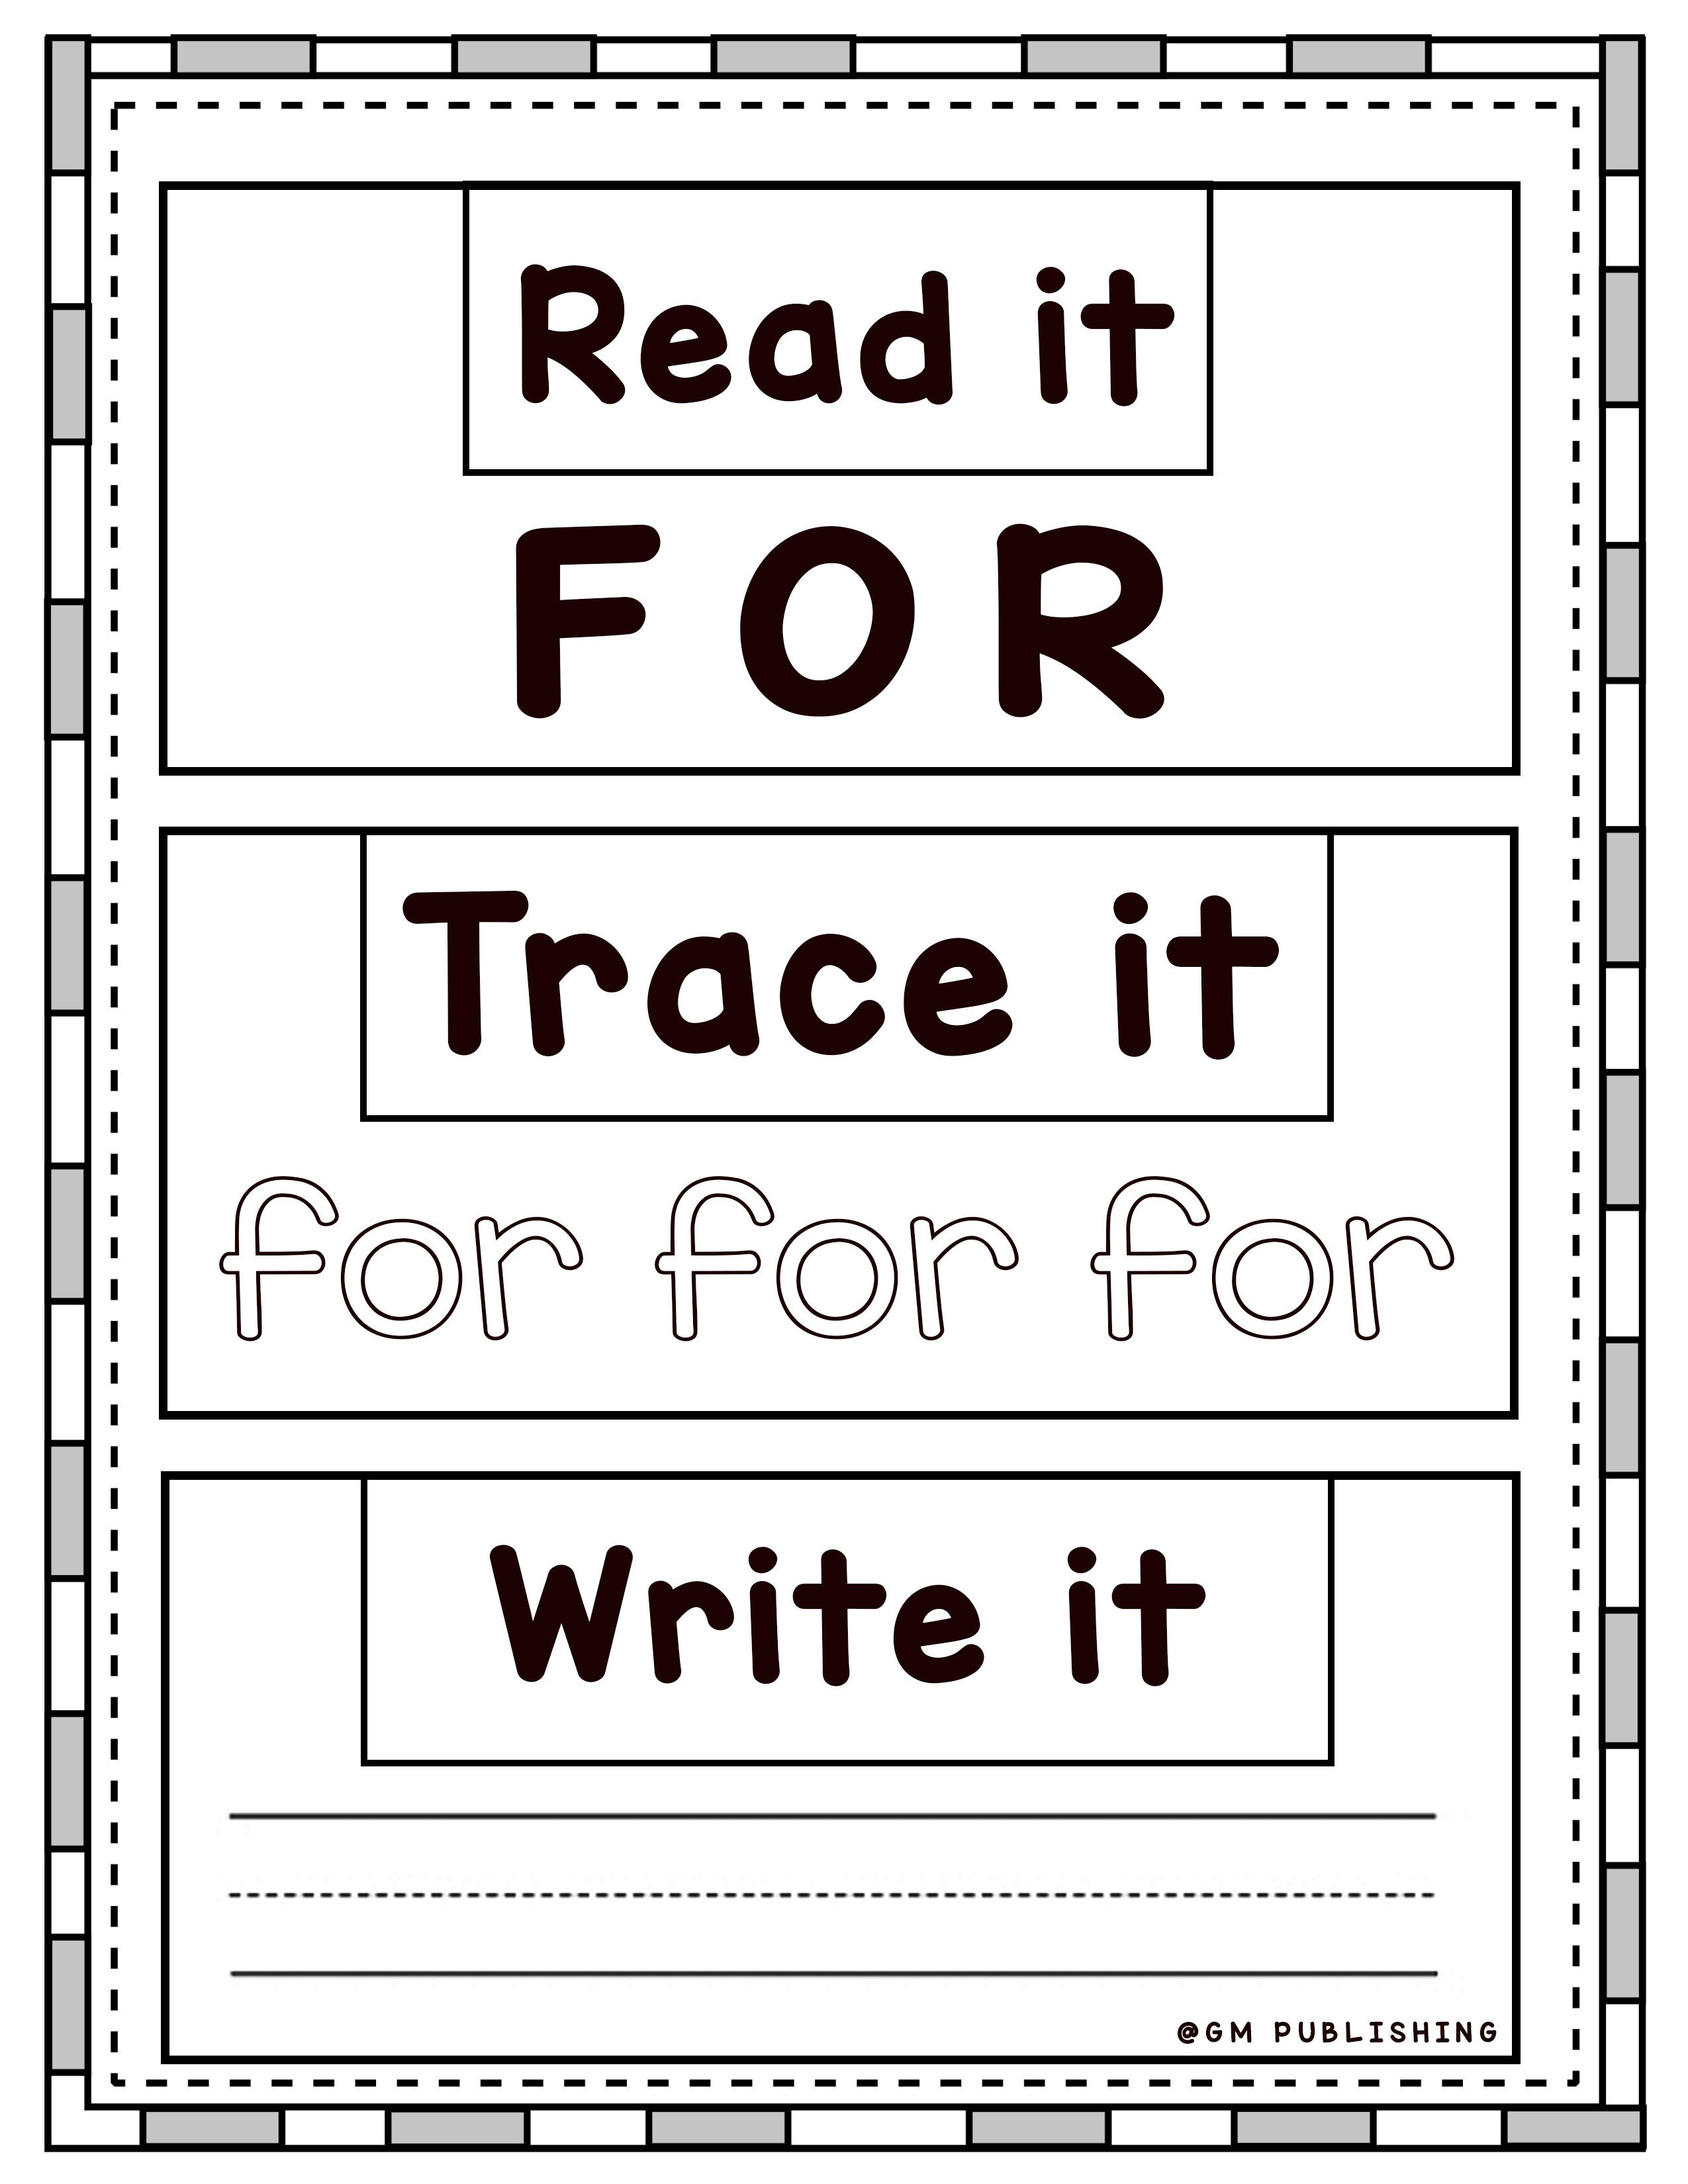 Tracing Writing For Grade 1 Workbook Worksheet Vocabulary Workbooks Writing Skills 1st Grade Spelling